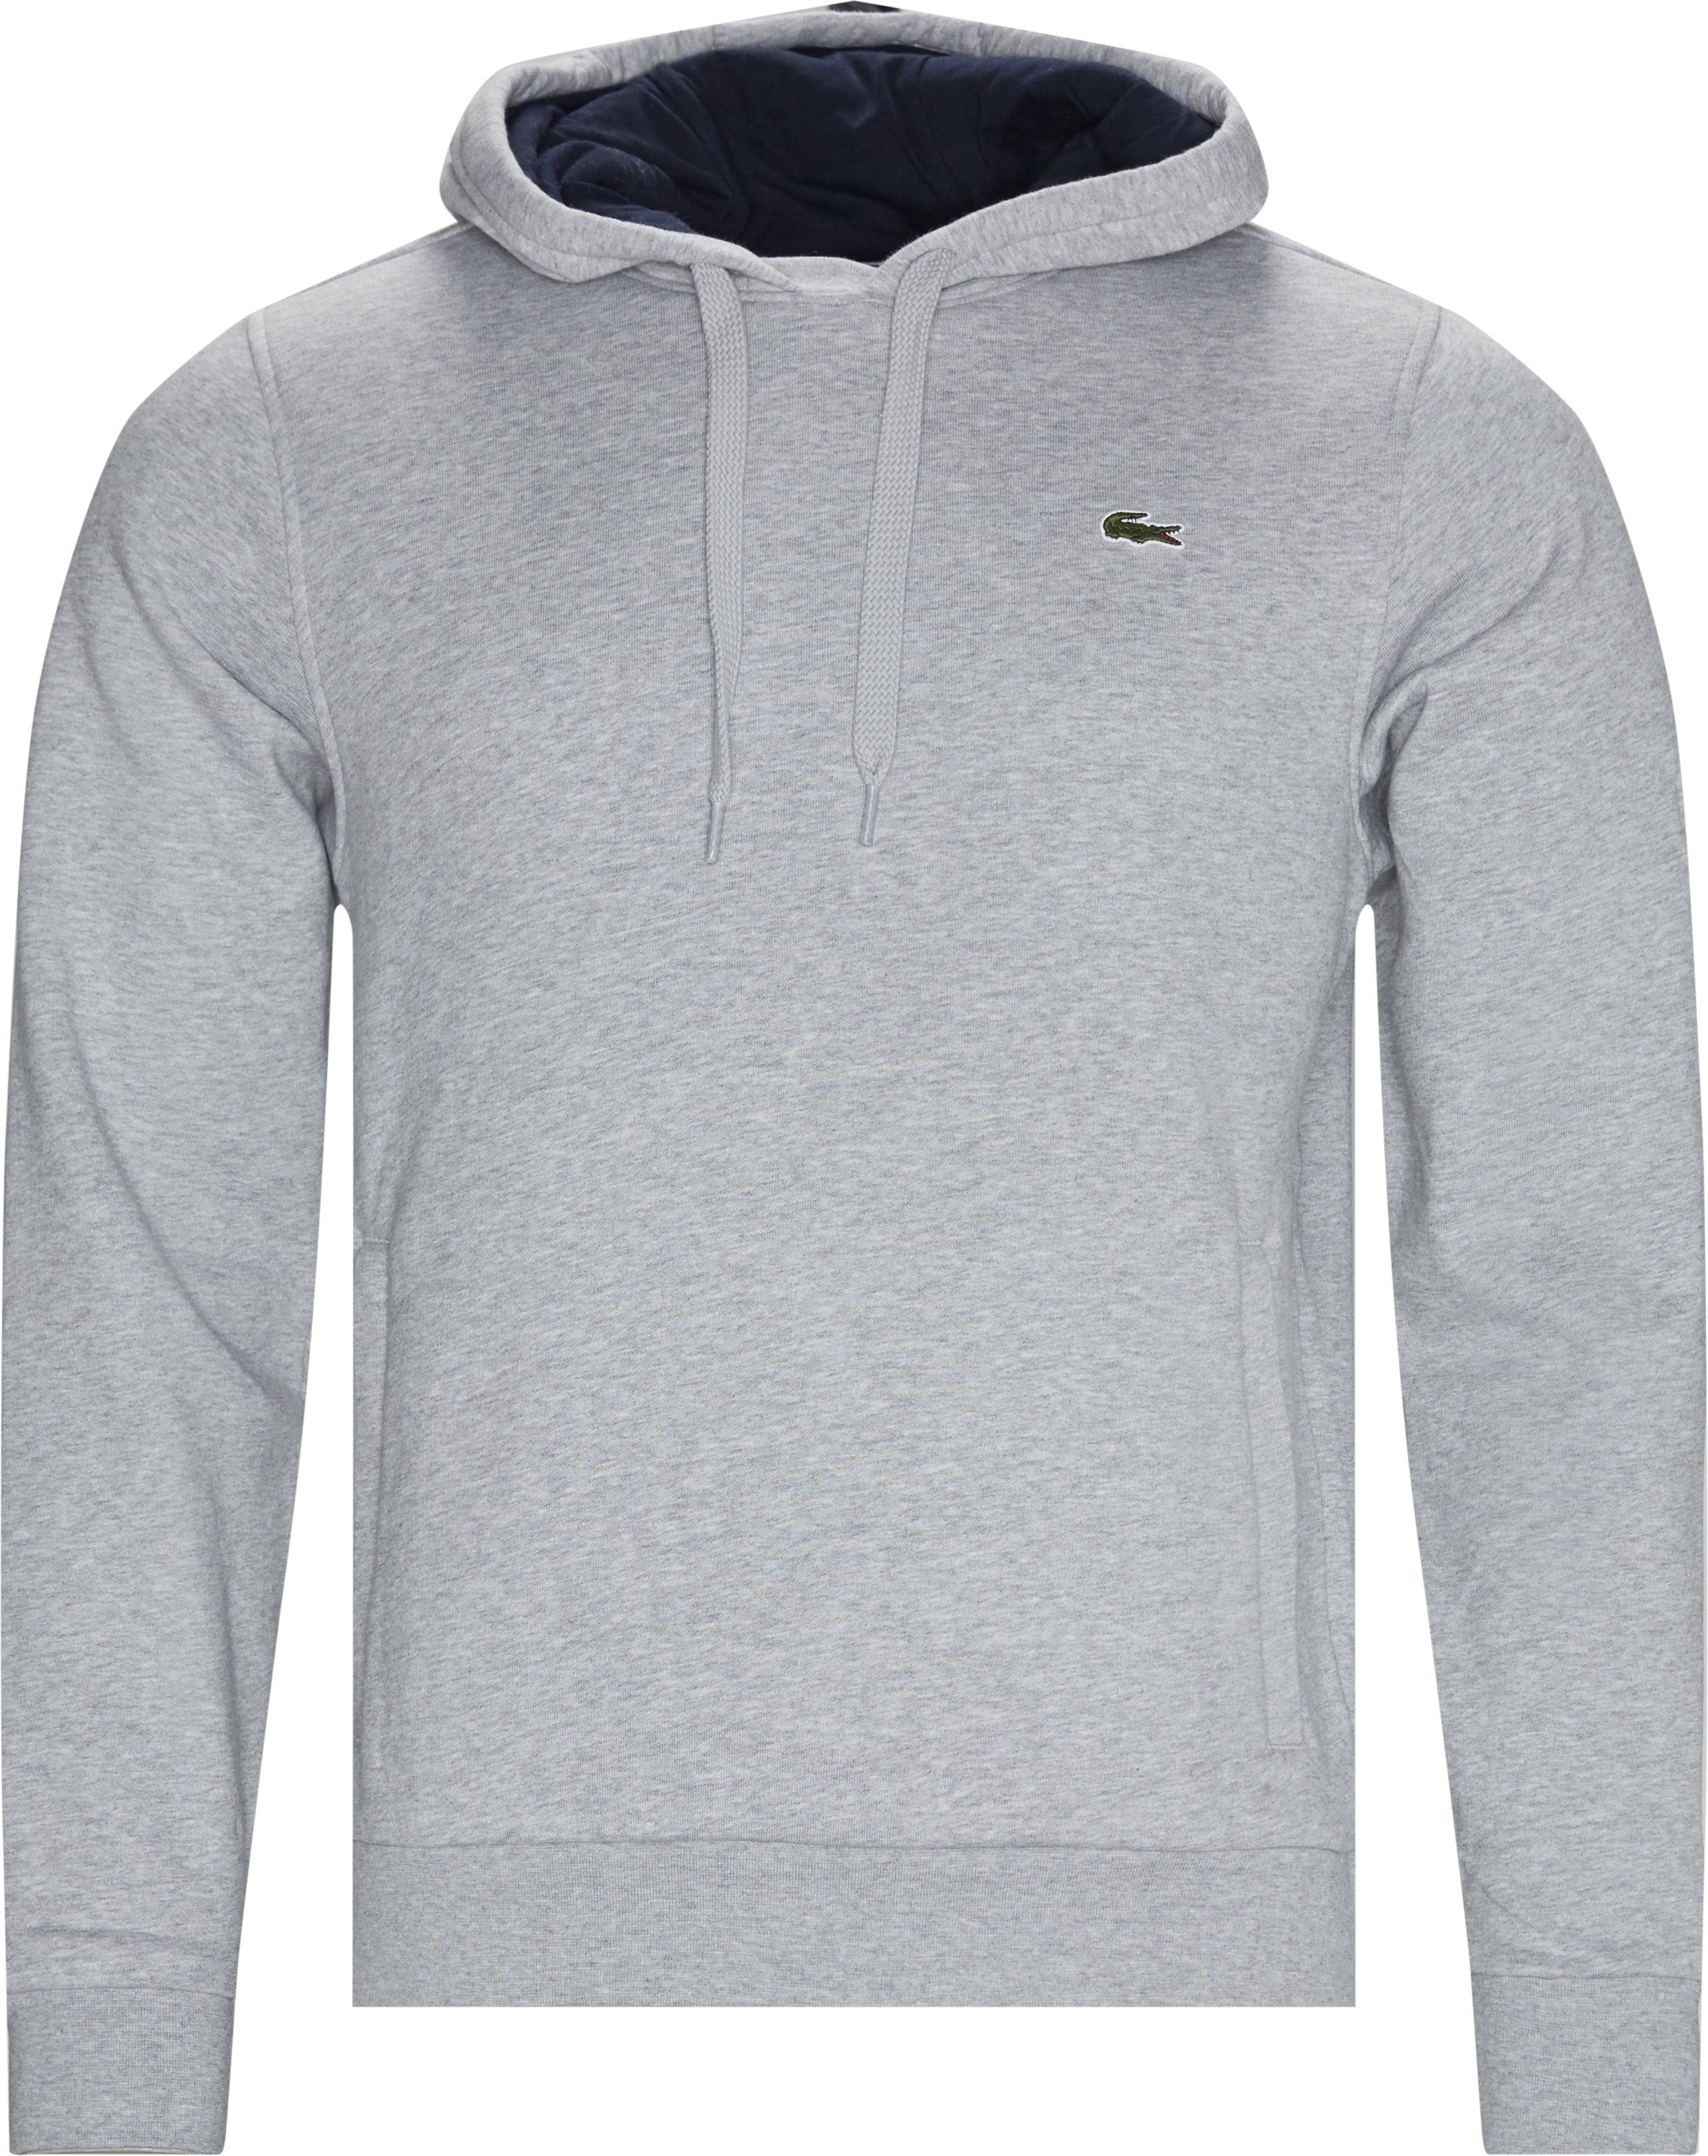 Hooded Fleece Tennis Sweatshirt - Sweatshirts - Regular fit - Grå